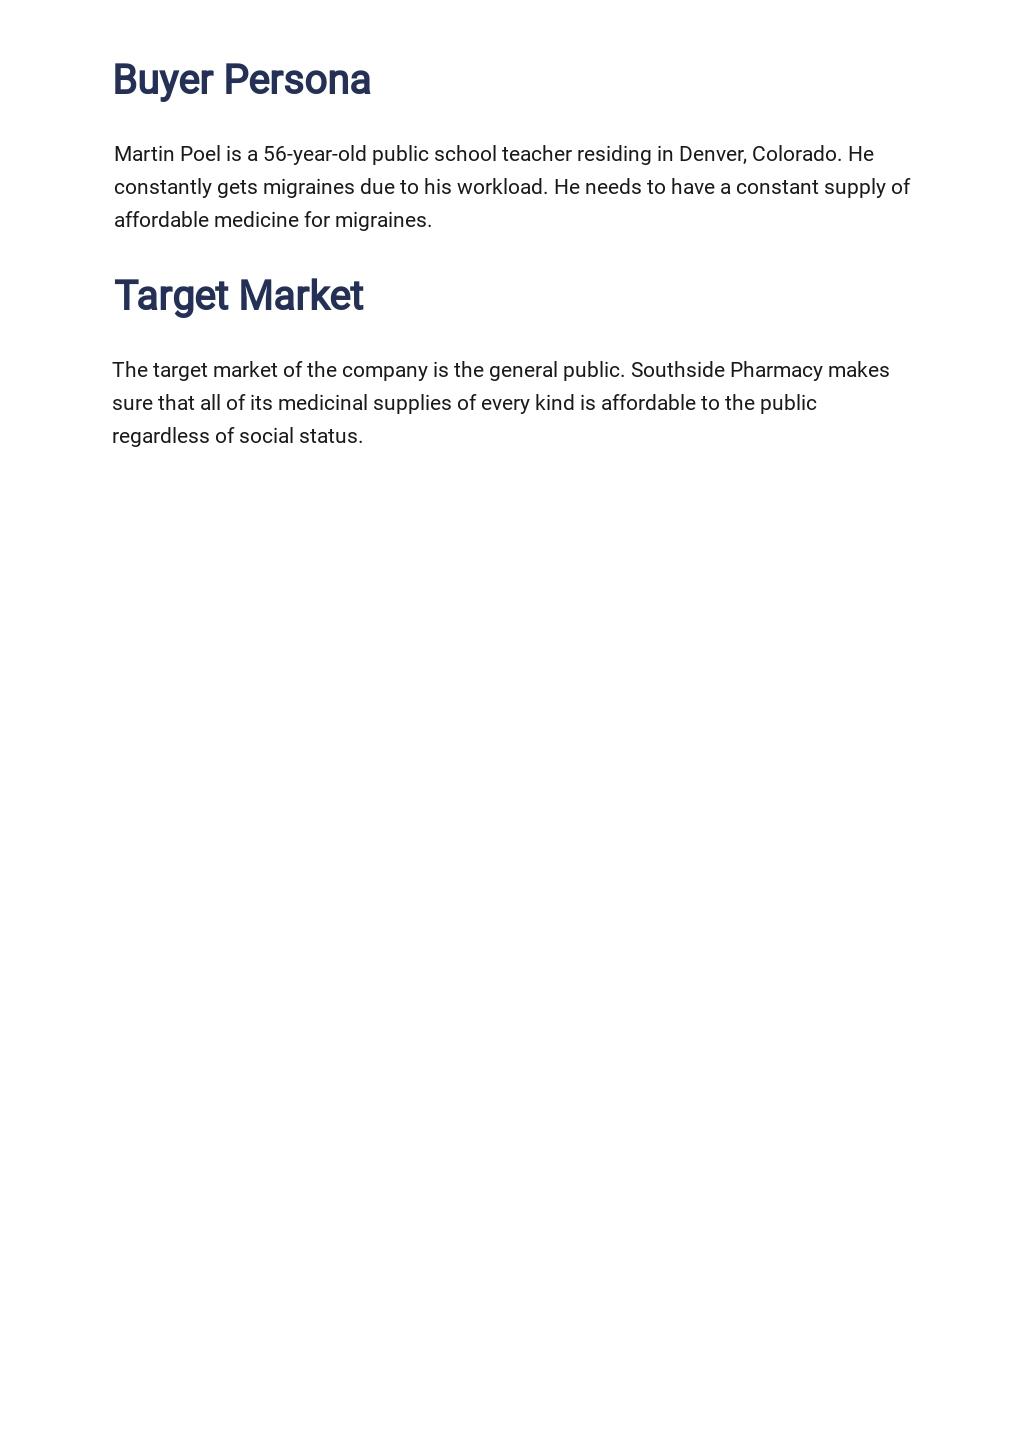 Pharmacy or Drug Store Marketing Plan Template 2.jpe